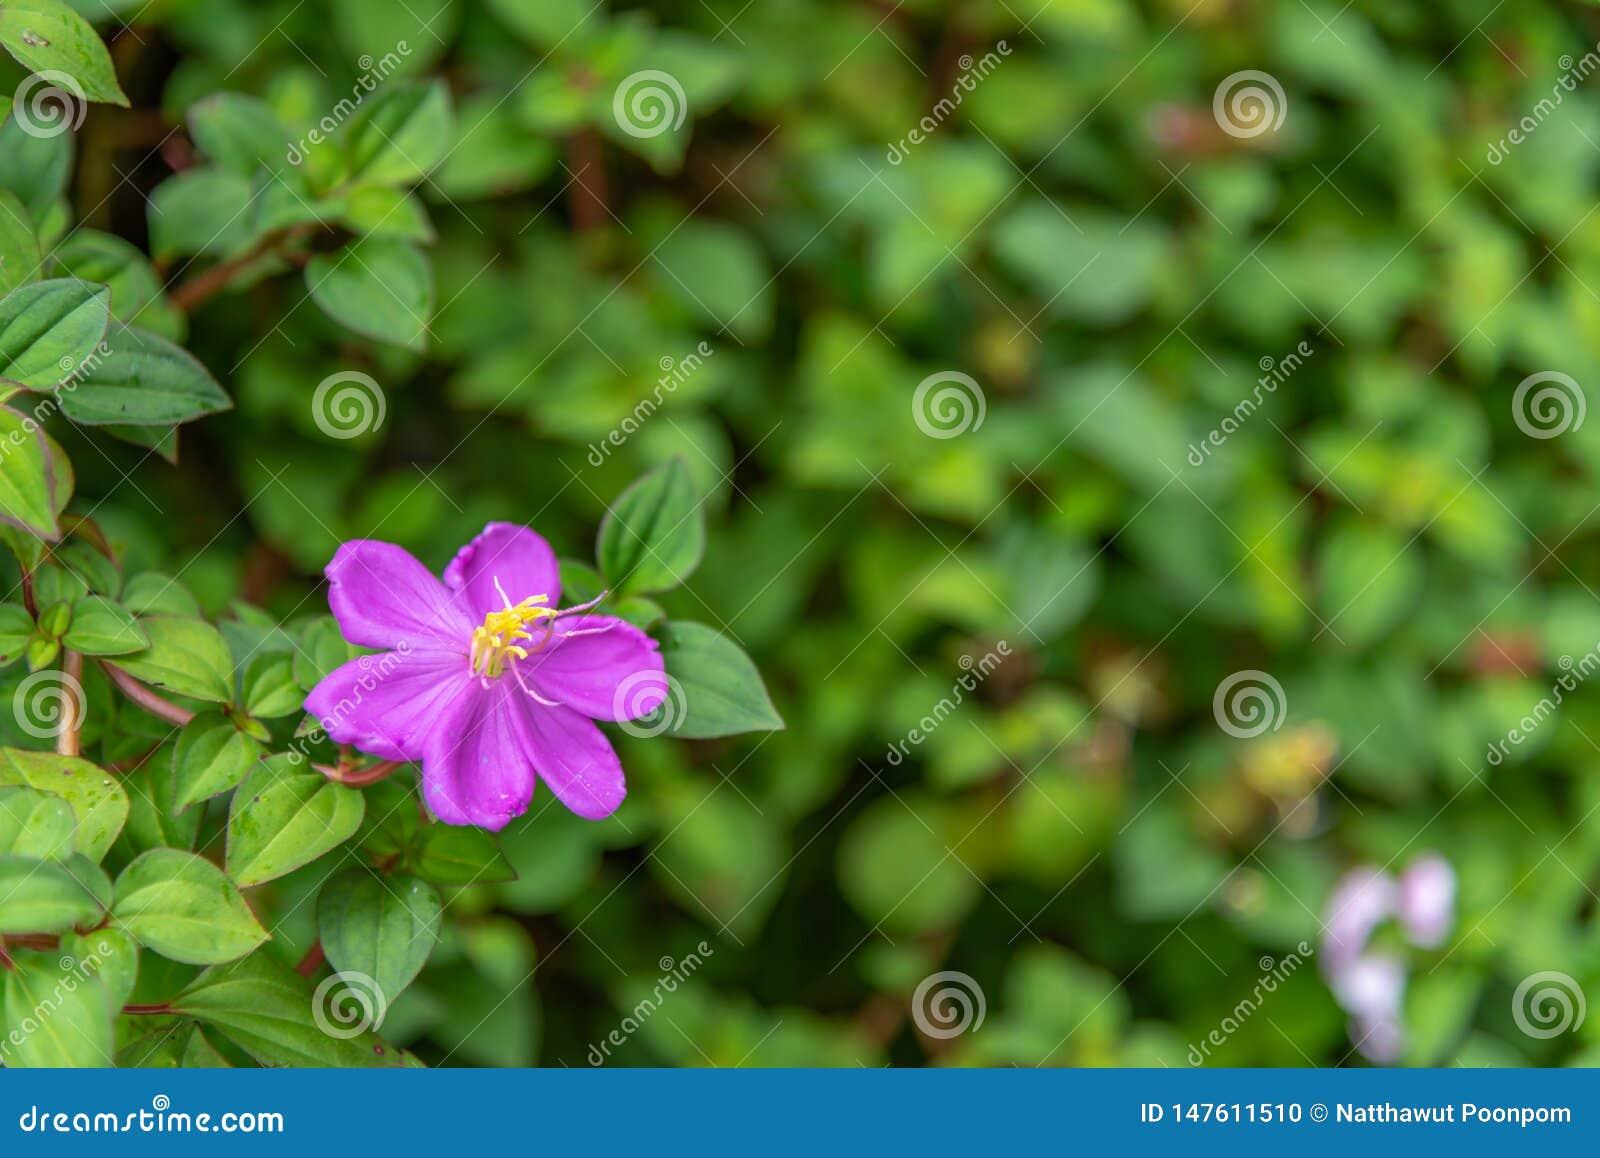 Den Dissotis rotundifoliaen har sex kronblad